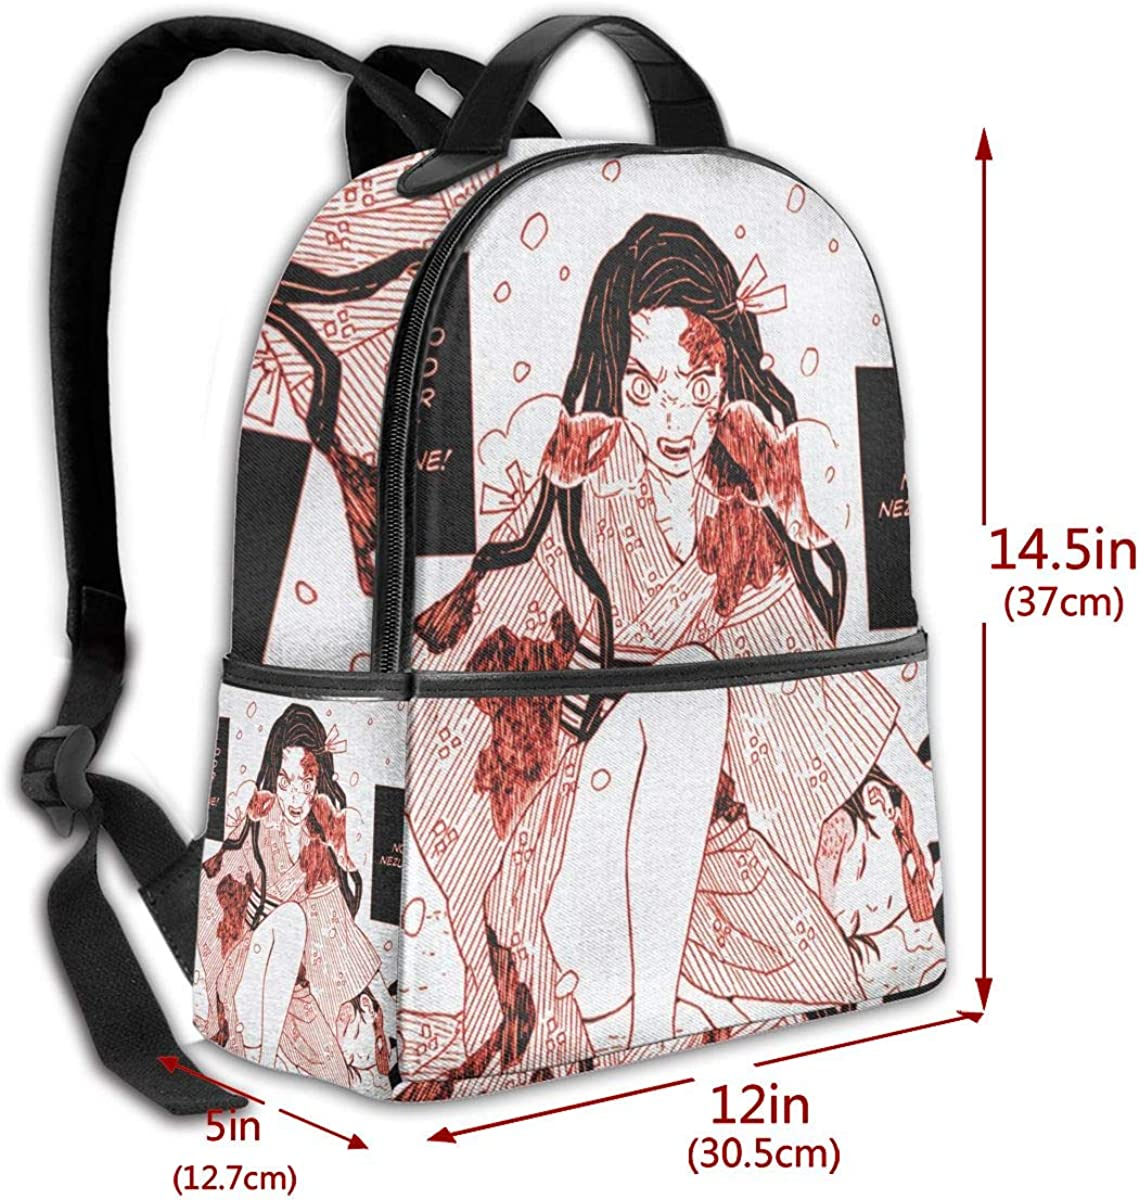 NanZYang School Backpack Nezuko Kamado Unisex Daypacks Laptop Bags Outdoor Travel Large Computer Bag Black